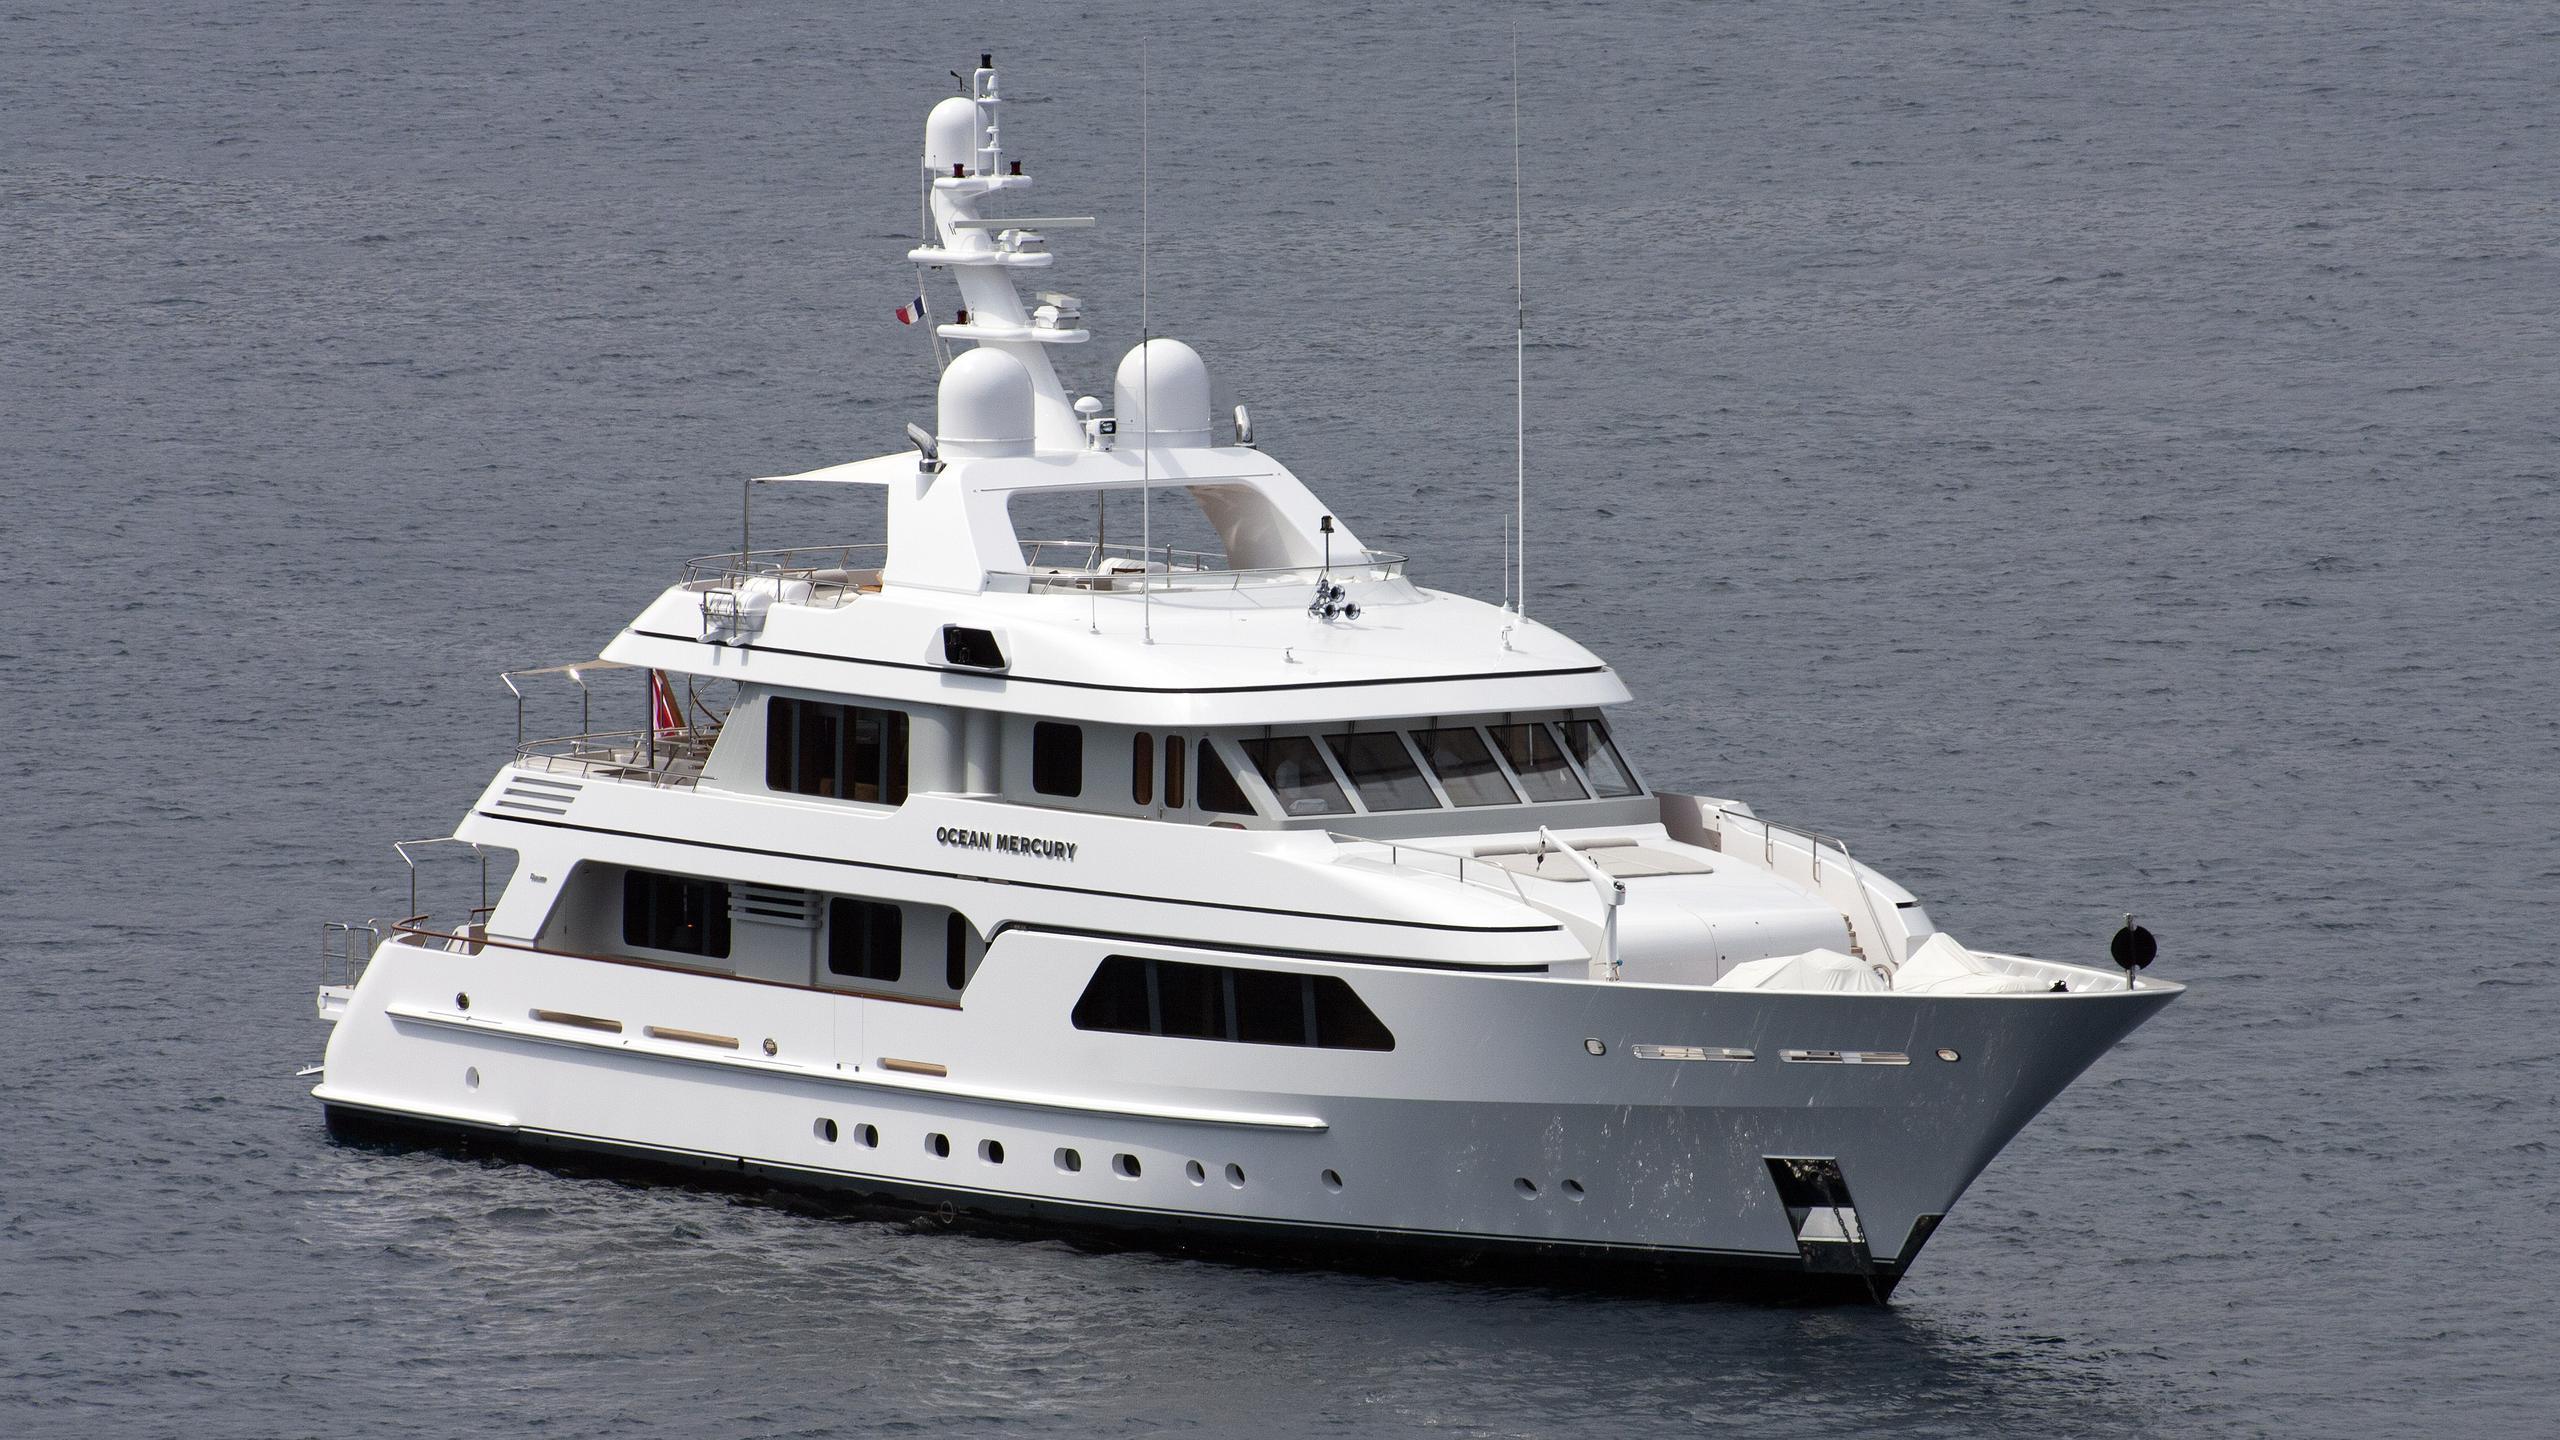 ocean-mercury-motor-yacht-feadship-SI-39-mki-2008-half-profile